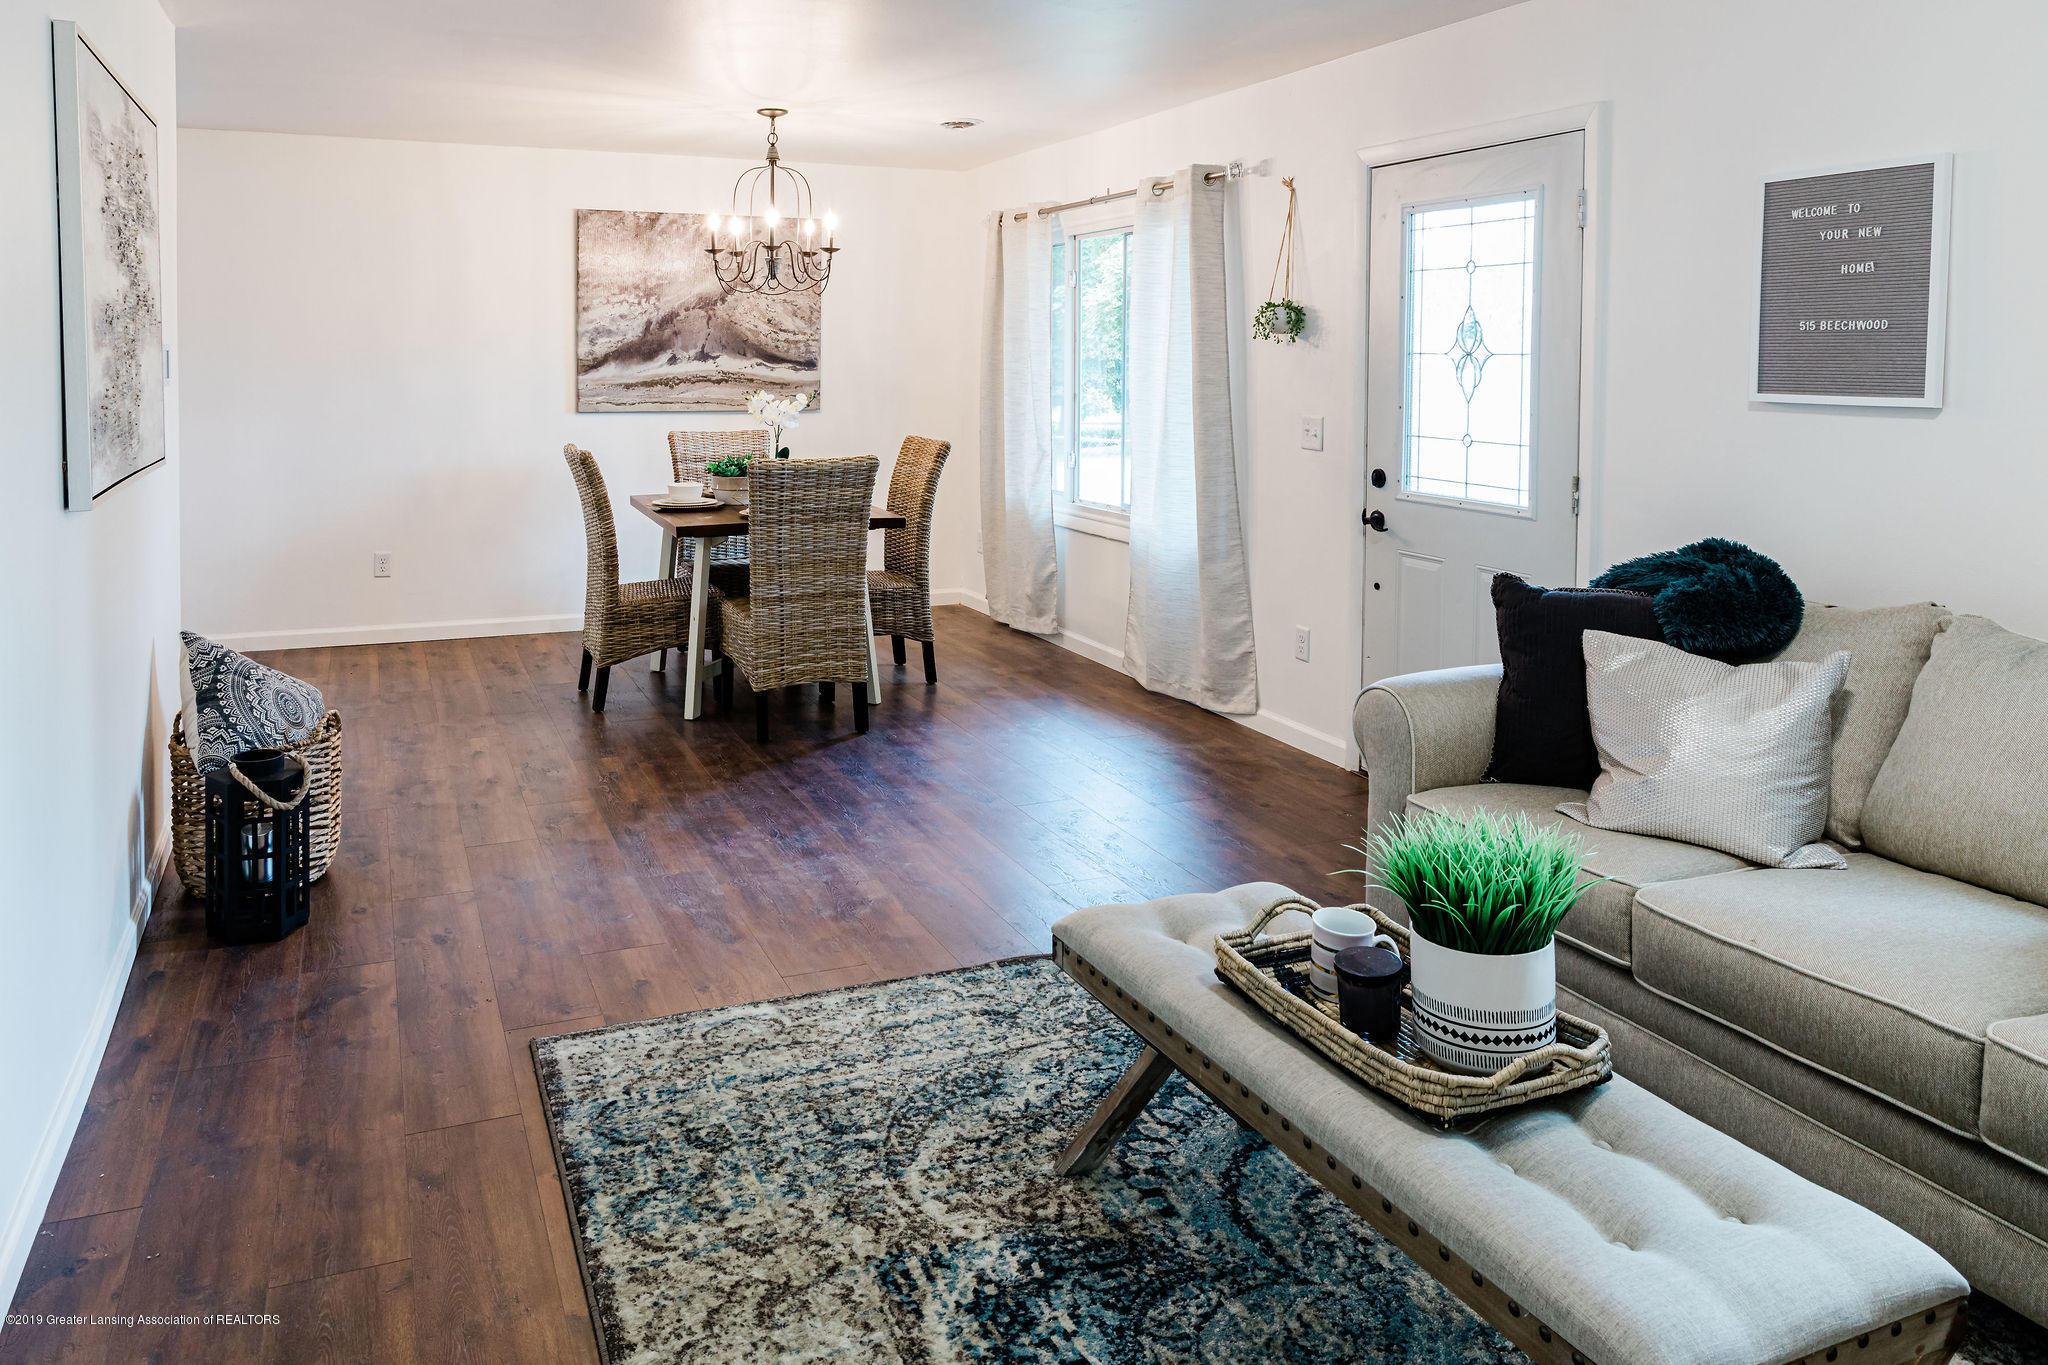 515 Beechwood St - Living Room/Dining Room - 12